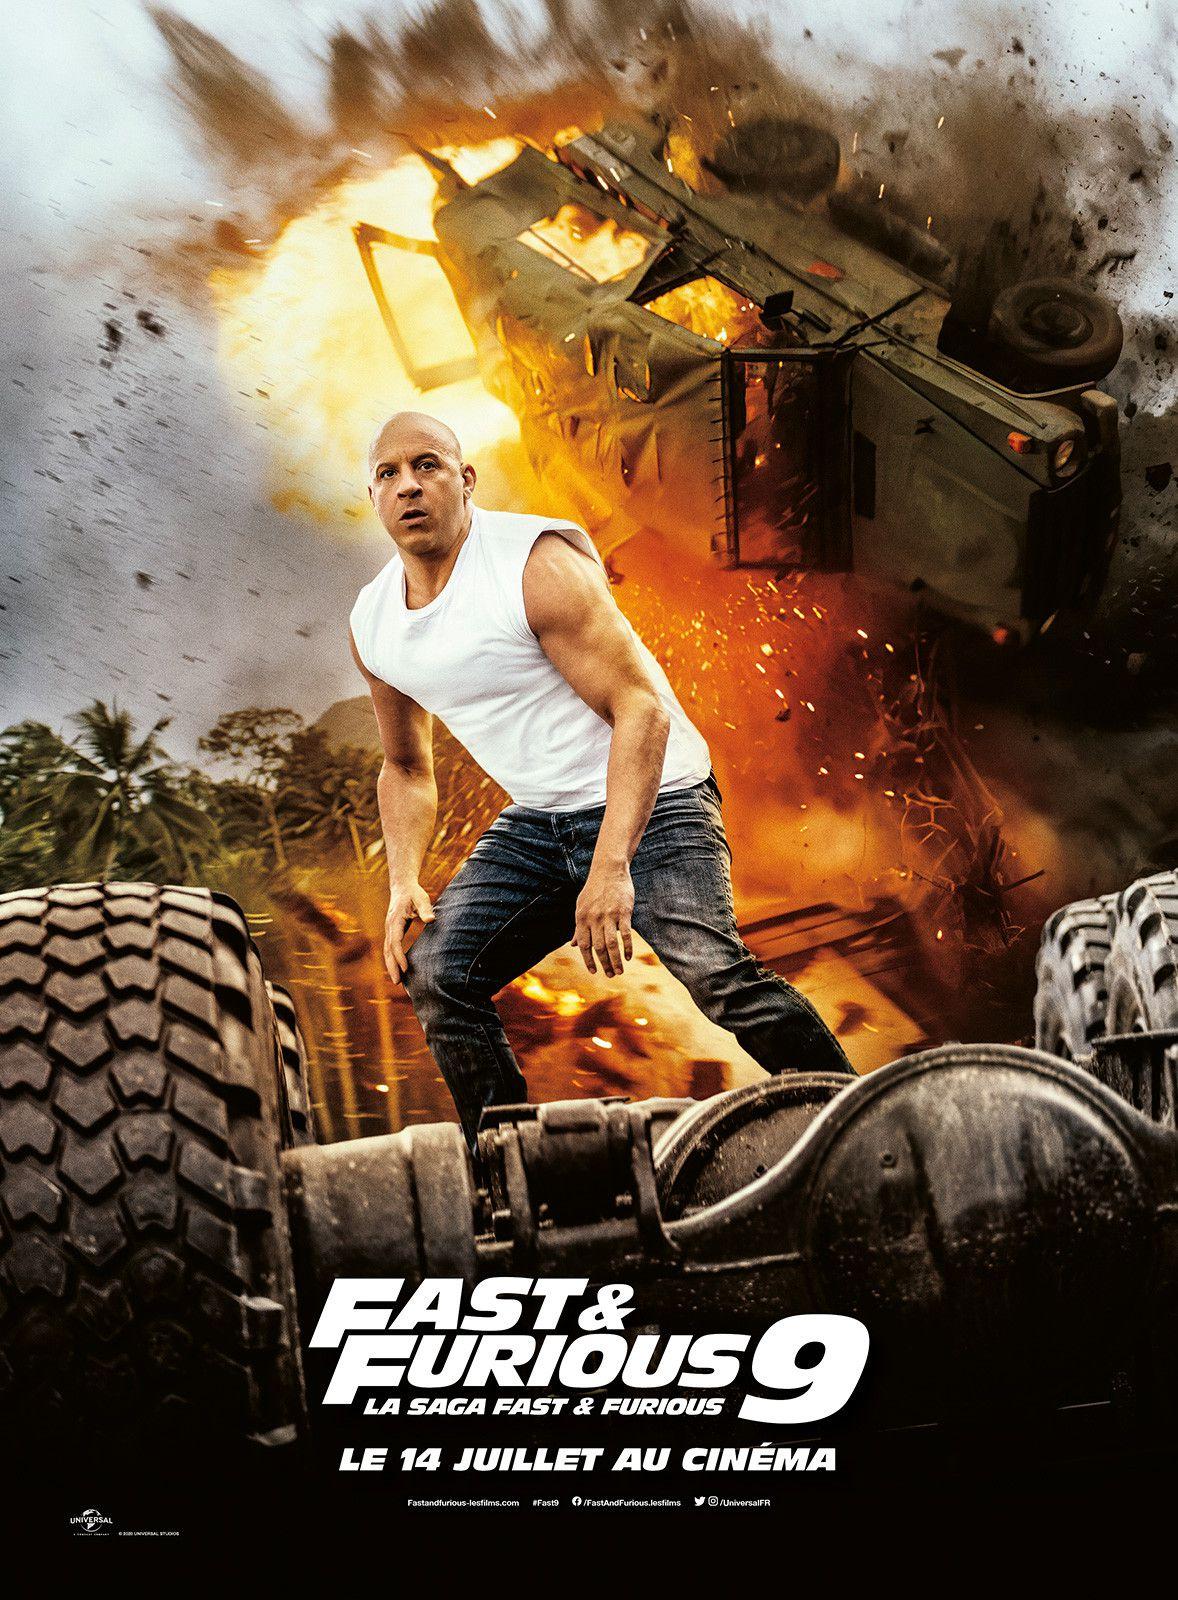 Fast & Furious 9 - Film (2021)